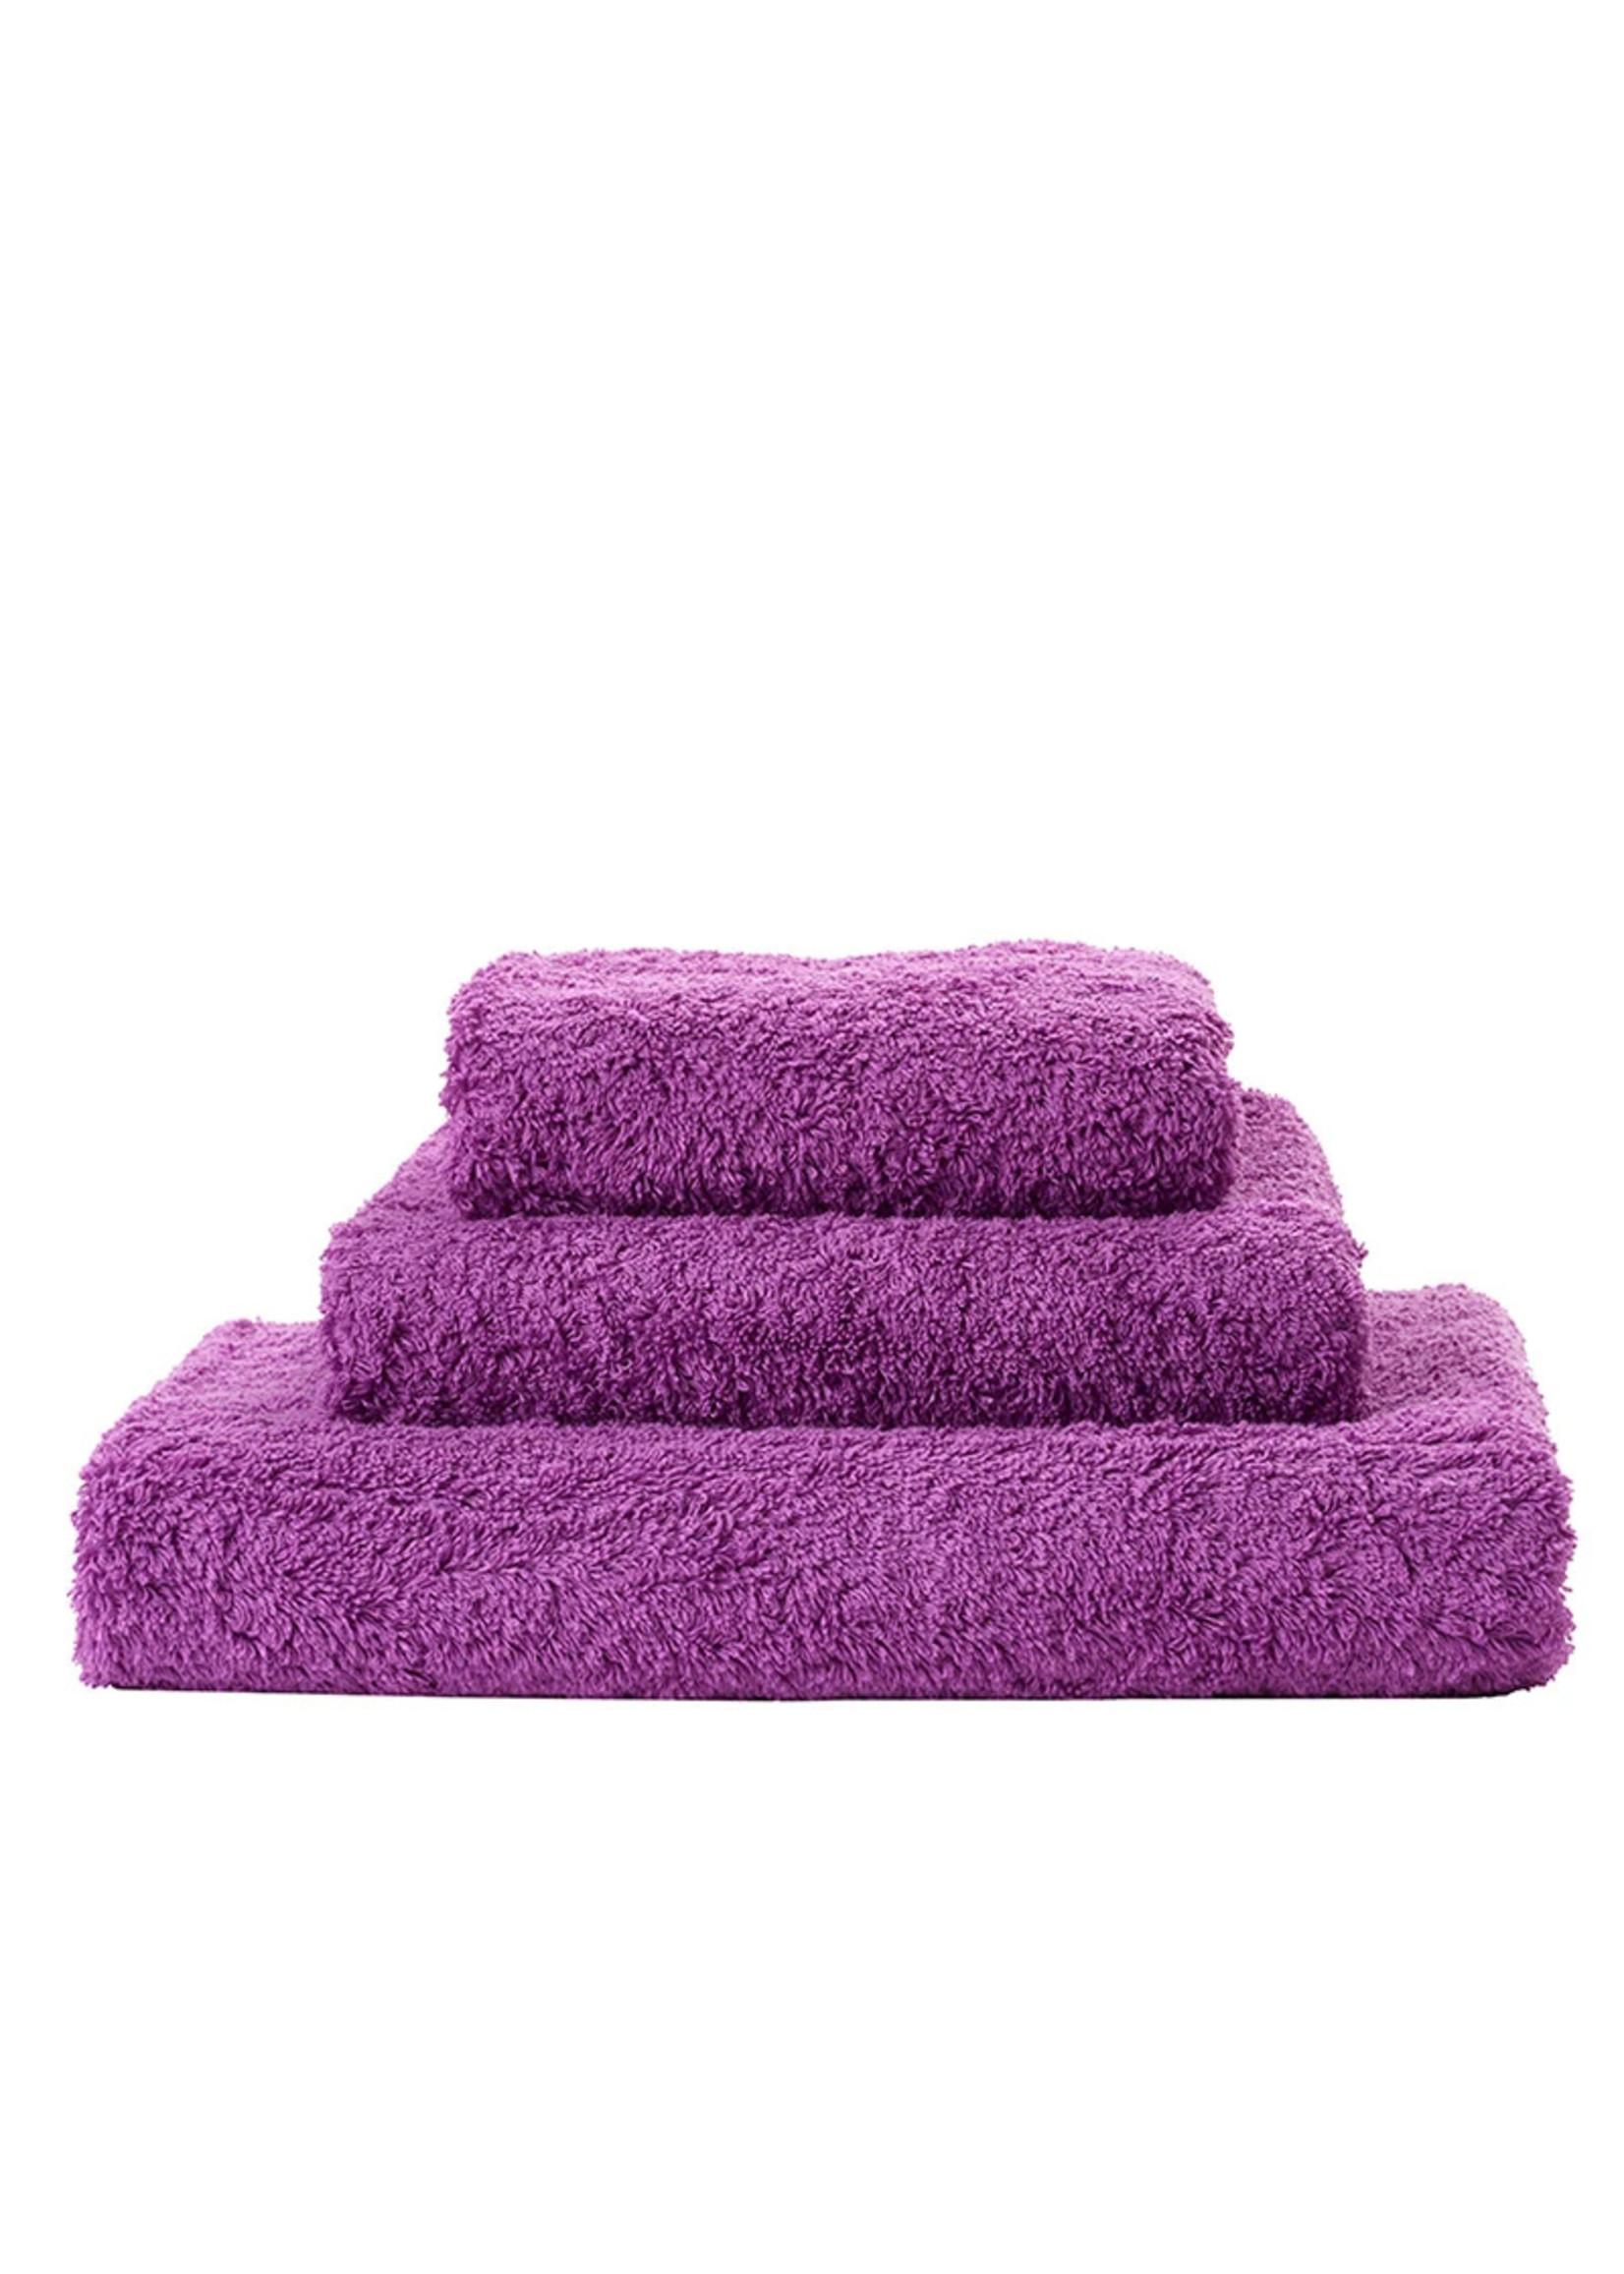 Abyss & Habidecor Super Pile Dahlia Towels